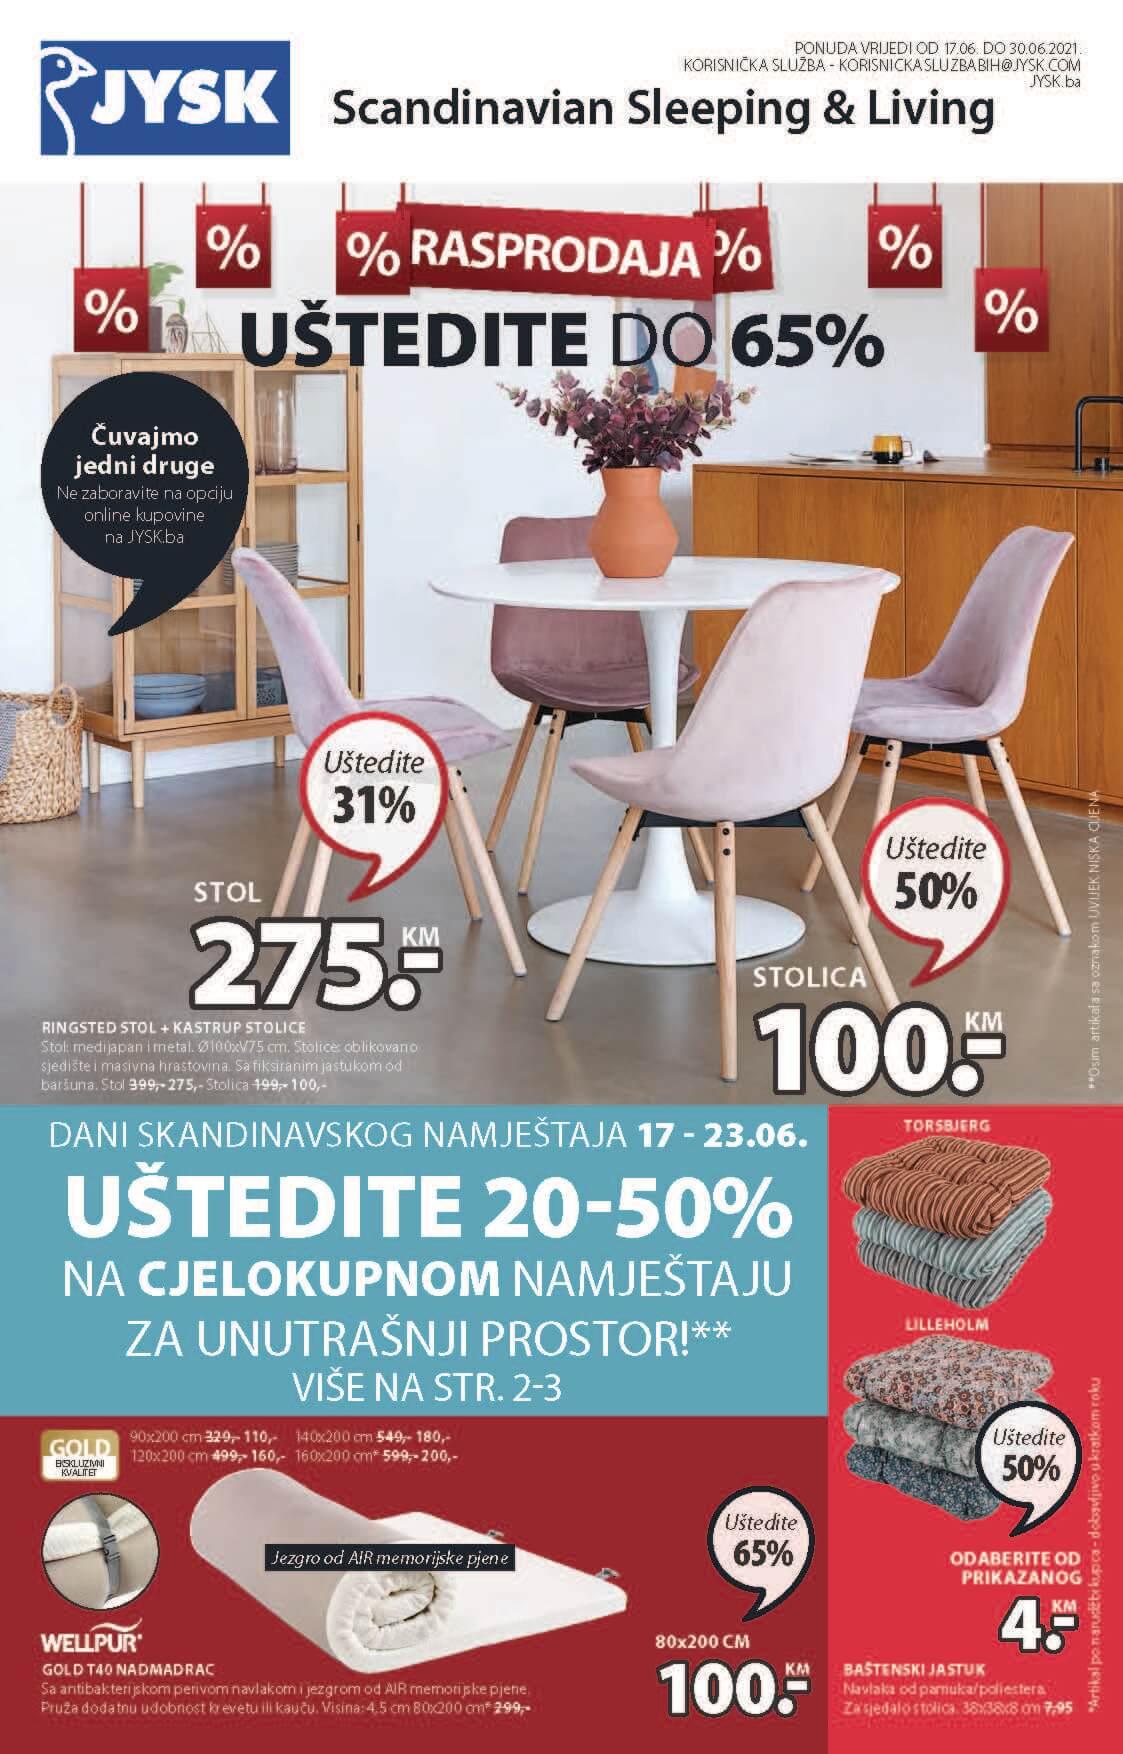 JYSK Katalog Ljetna RASPRODAJA JUN 2021 17.6. 30.6. ekatalozi.com PR Page 02 1